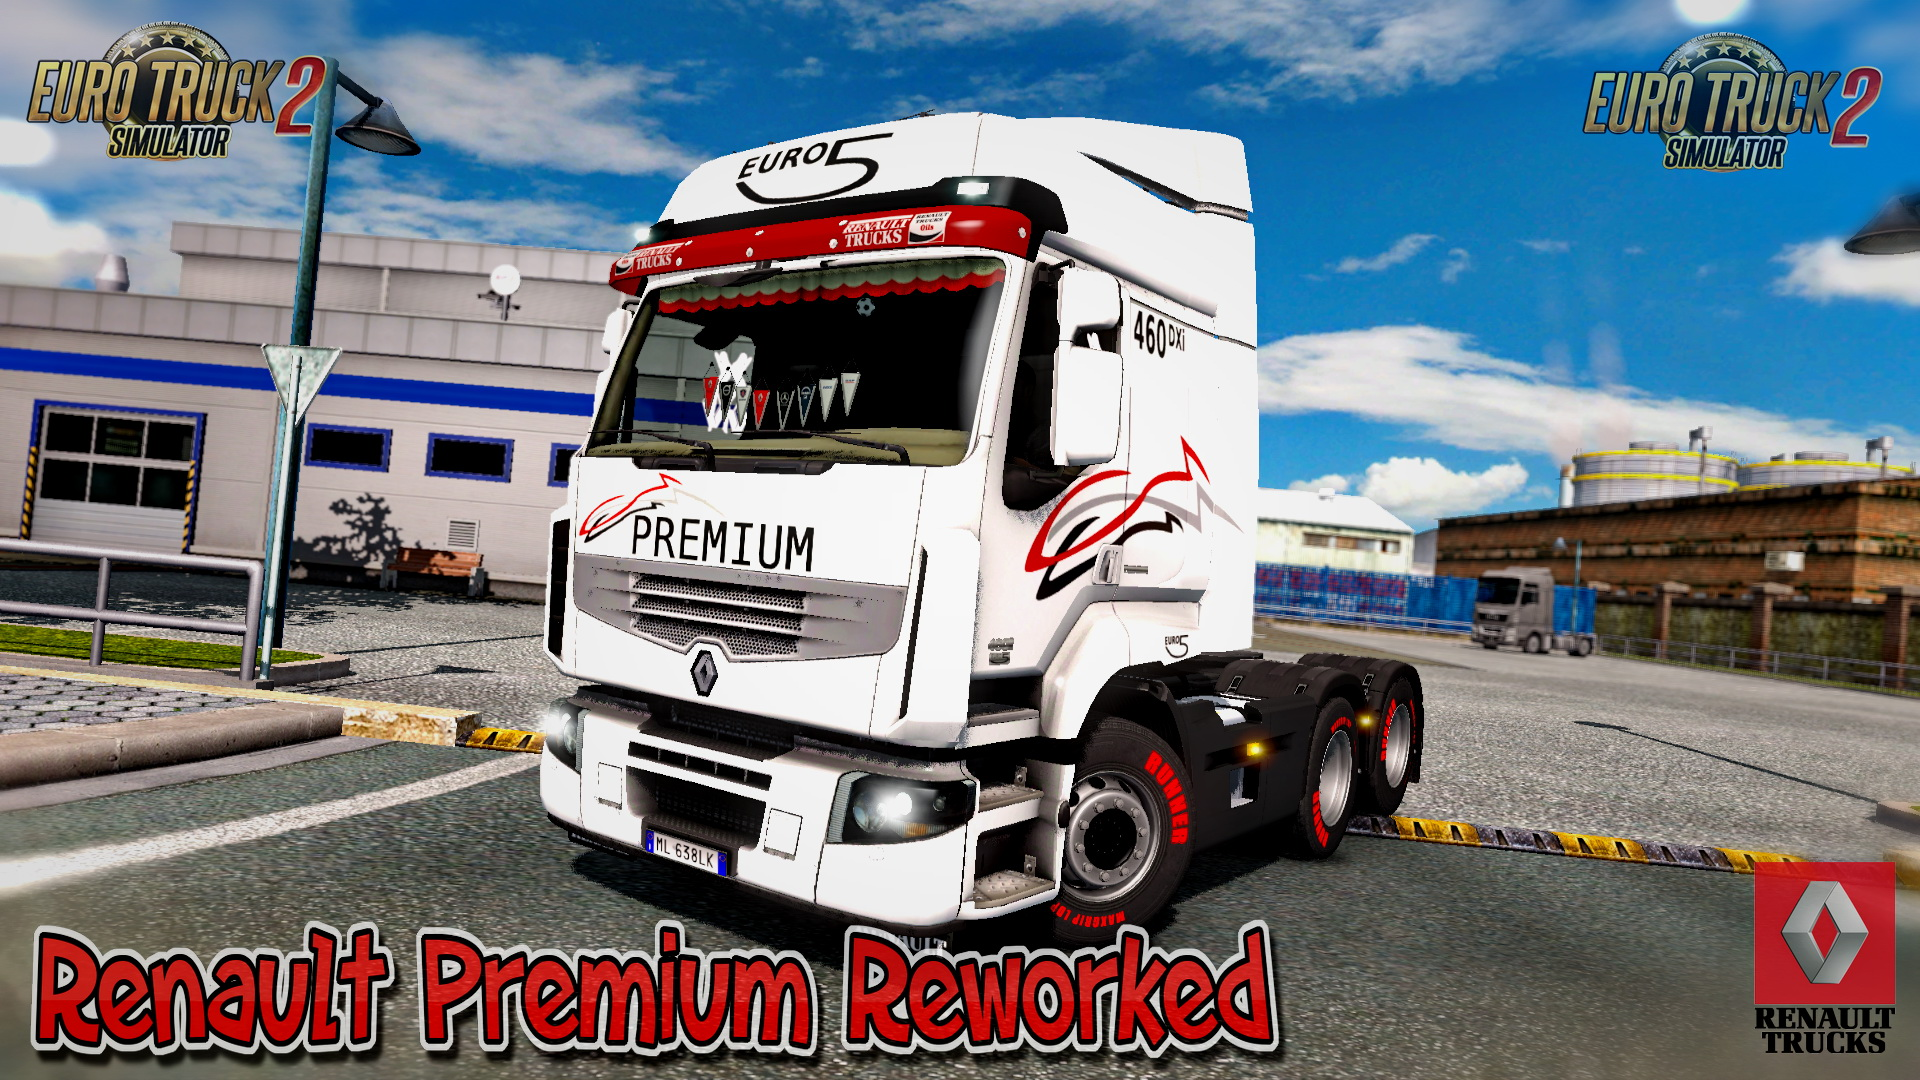 Renault Premium Reworked v4.5 by Schumi (1.32.x)